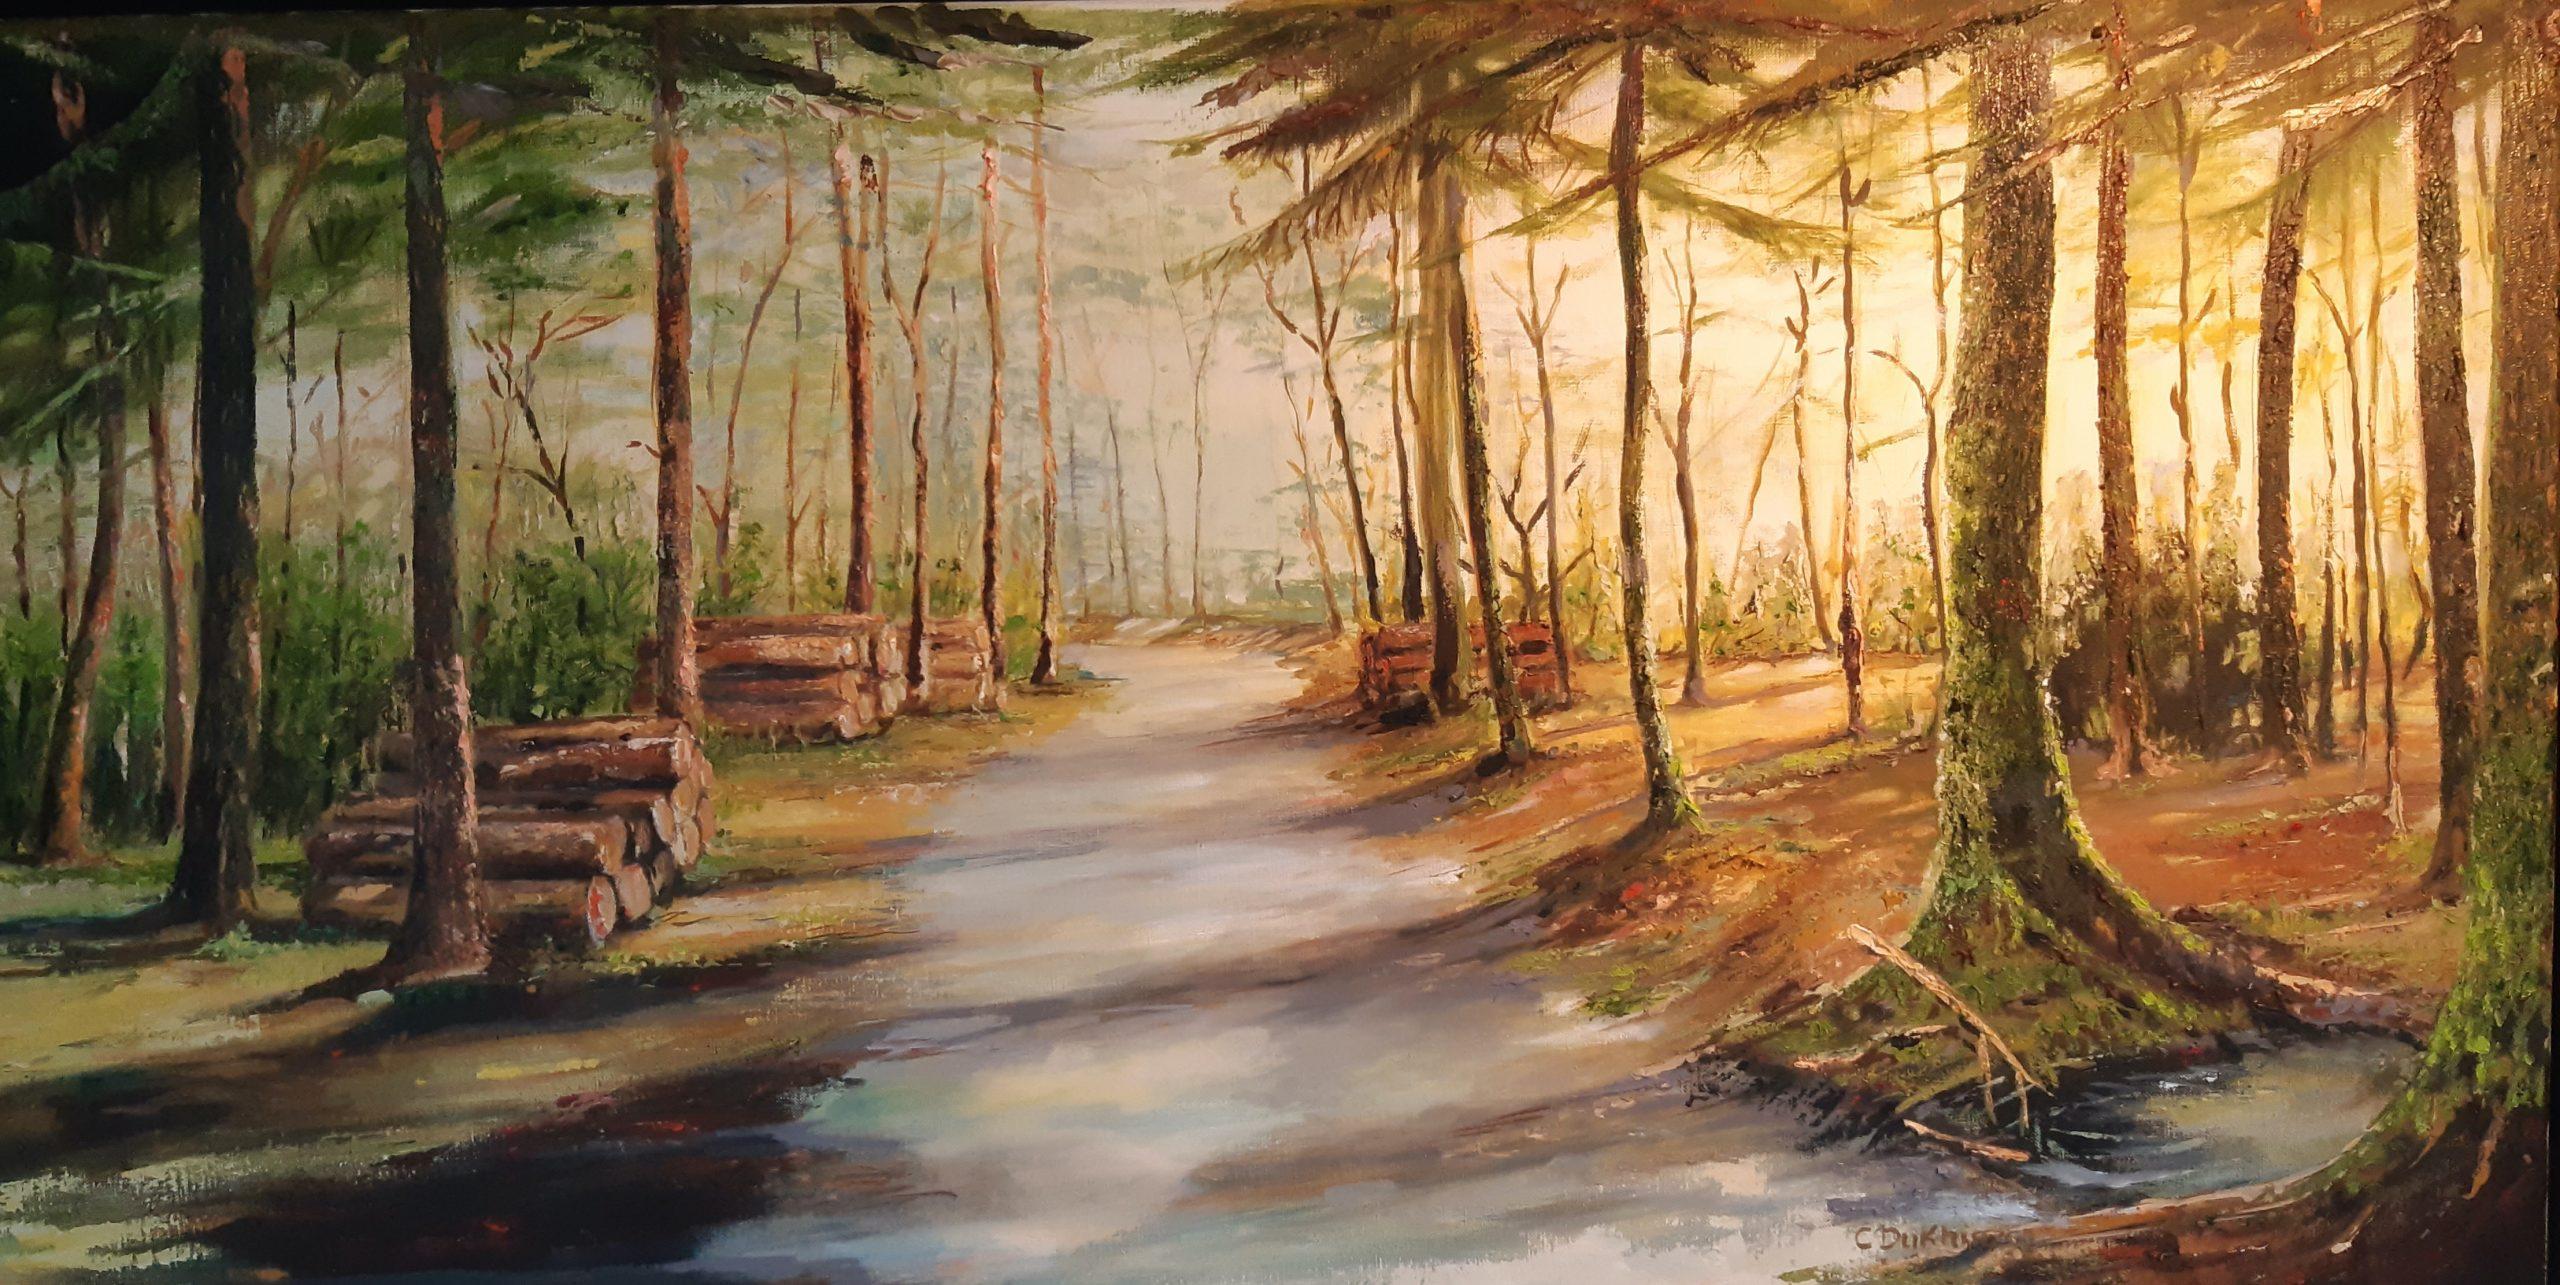 Het pad na de waskolk - Olieverf - 60 x 120 cm